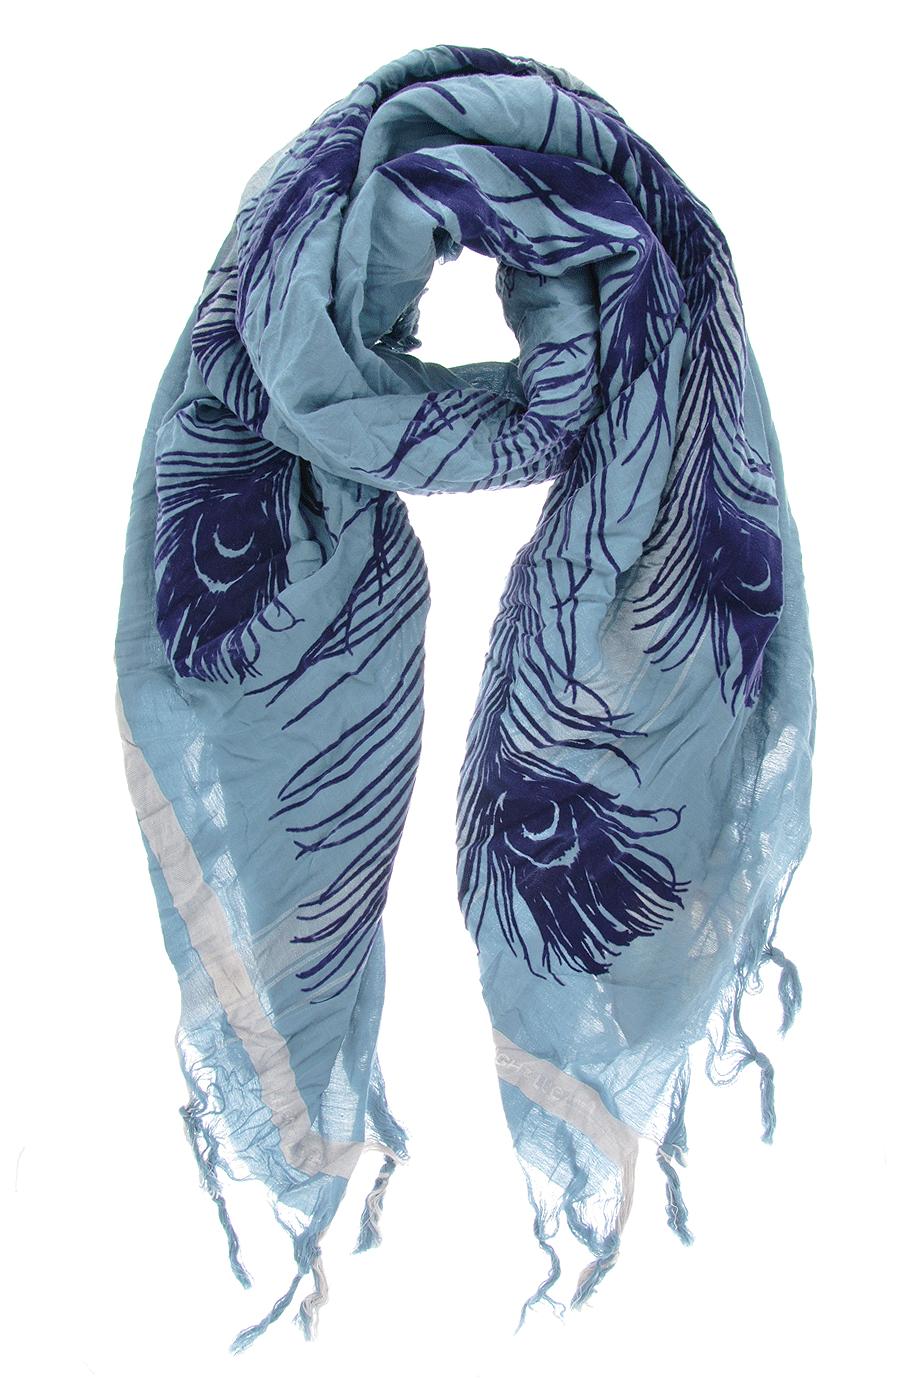 bc709c799b69b LEIGH & LUCA PEACOCK Denim Blue Flock Scarf - ACCESSORIES   SCARVES   Wool  Scarves   PRET-A-BEAUTE.COM